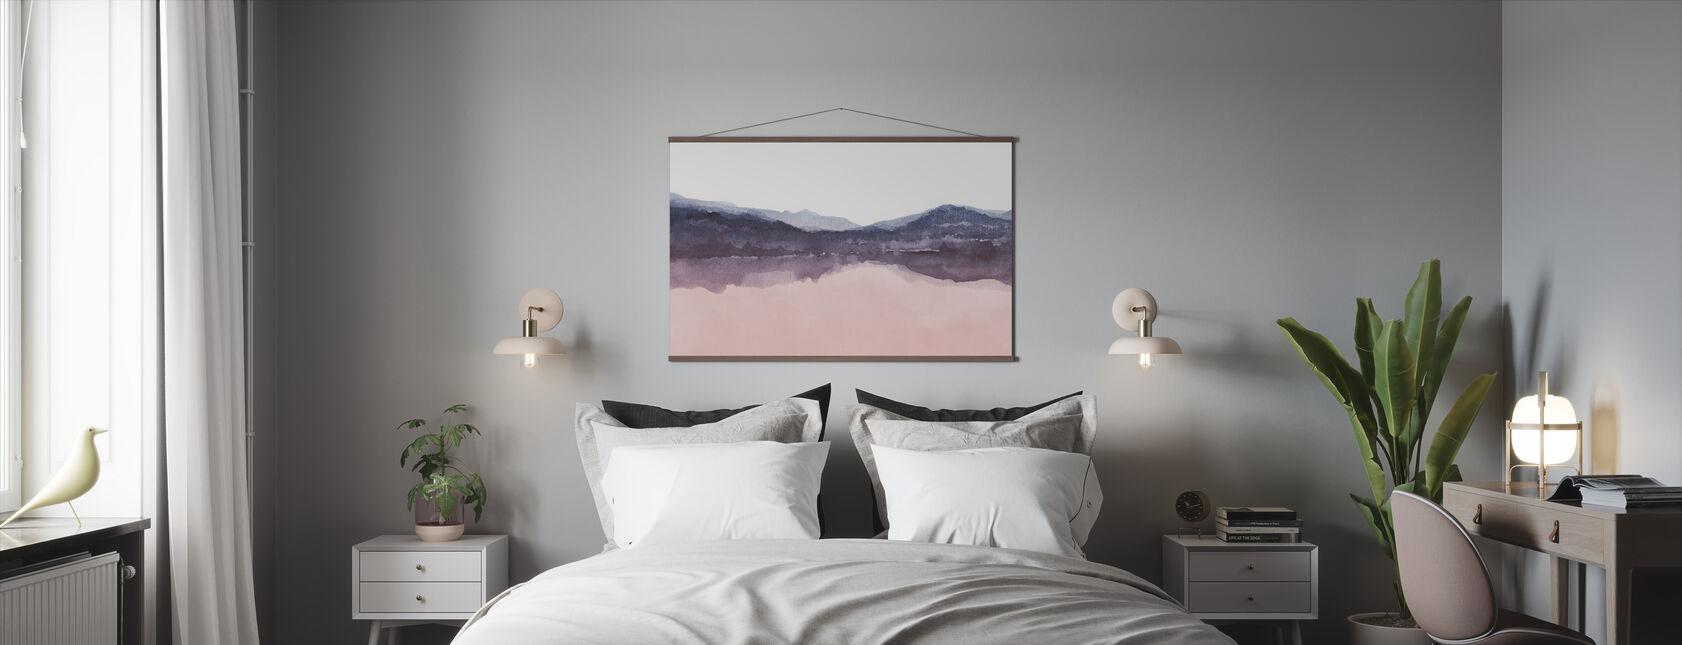 Watercolor Landscape IV - Pink and Blue - Poster - Bedroom